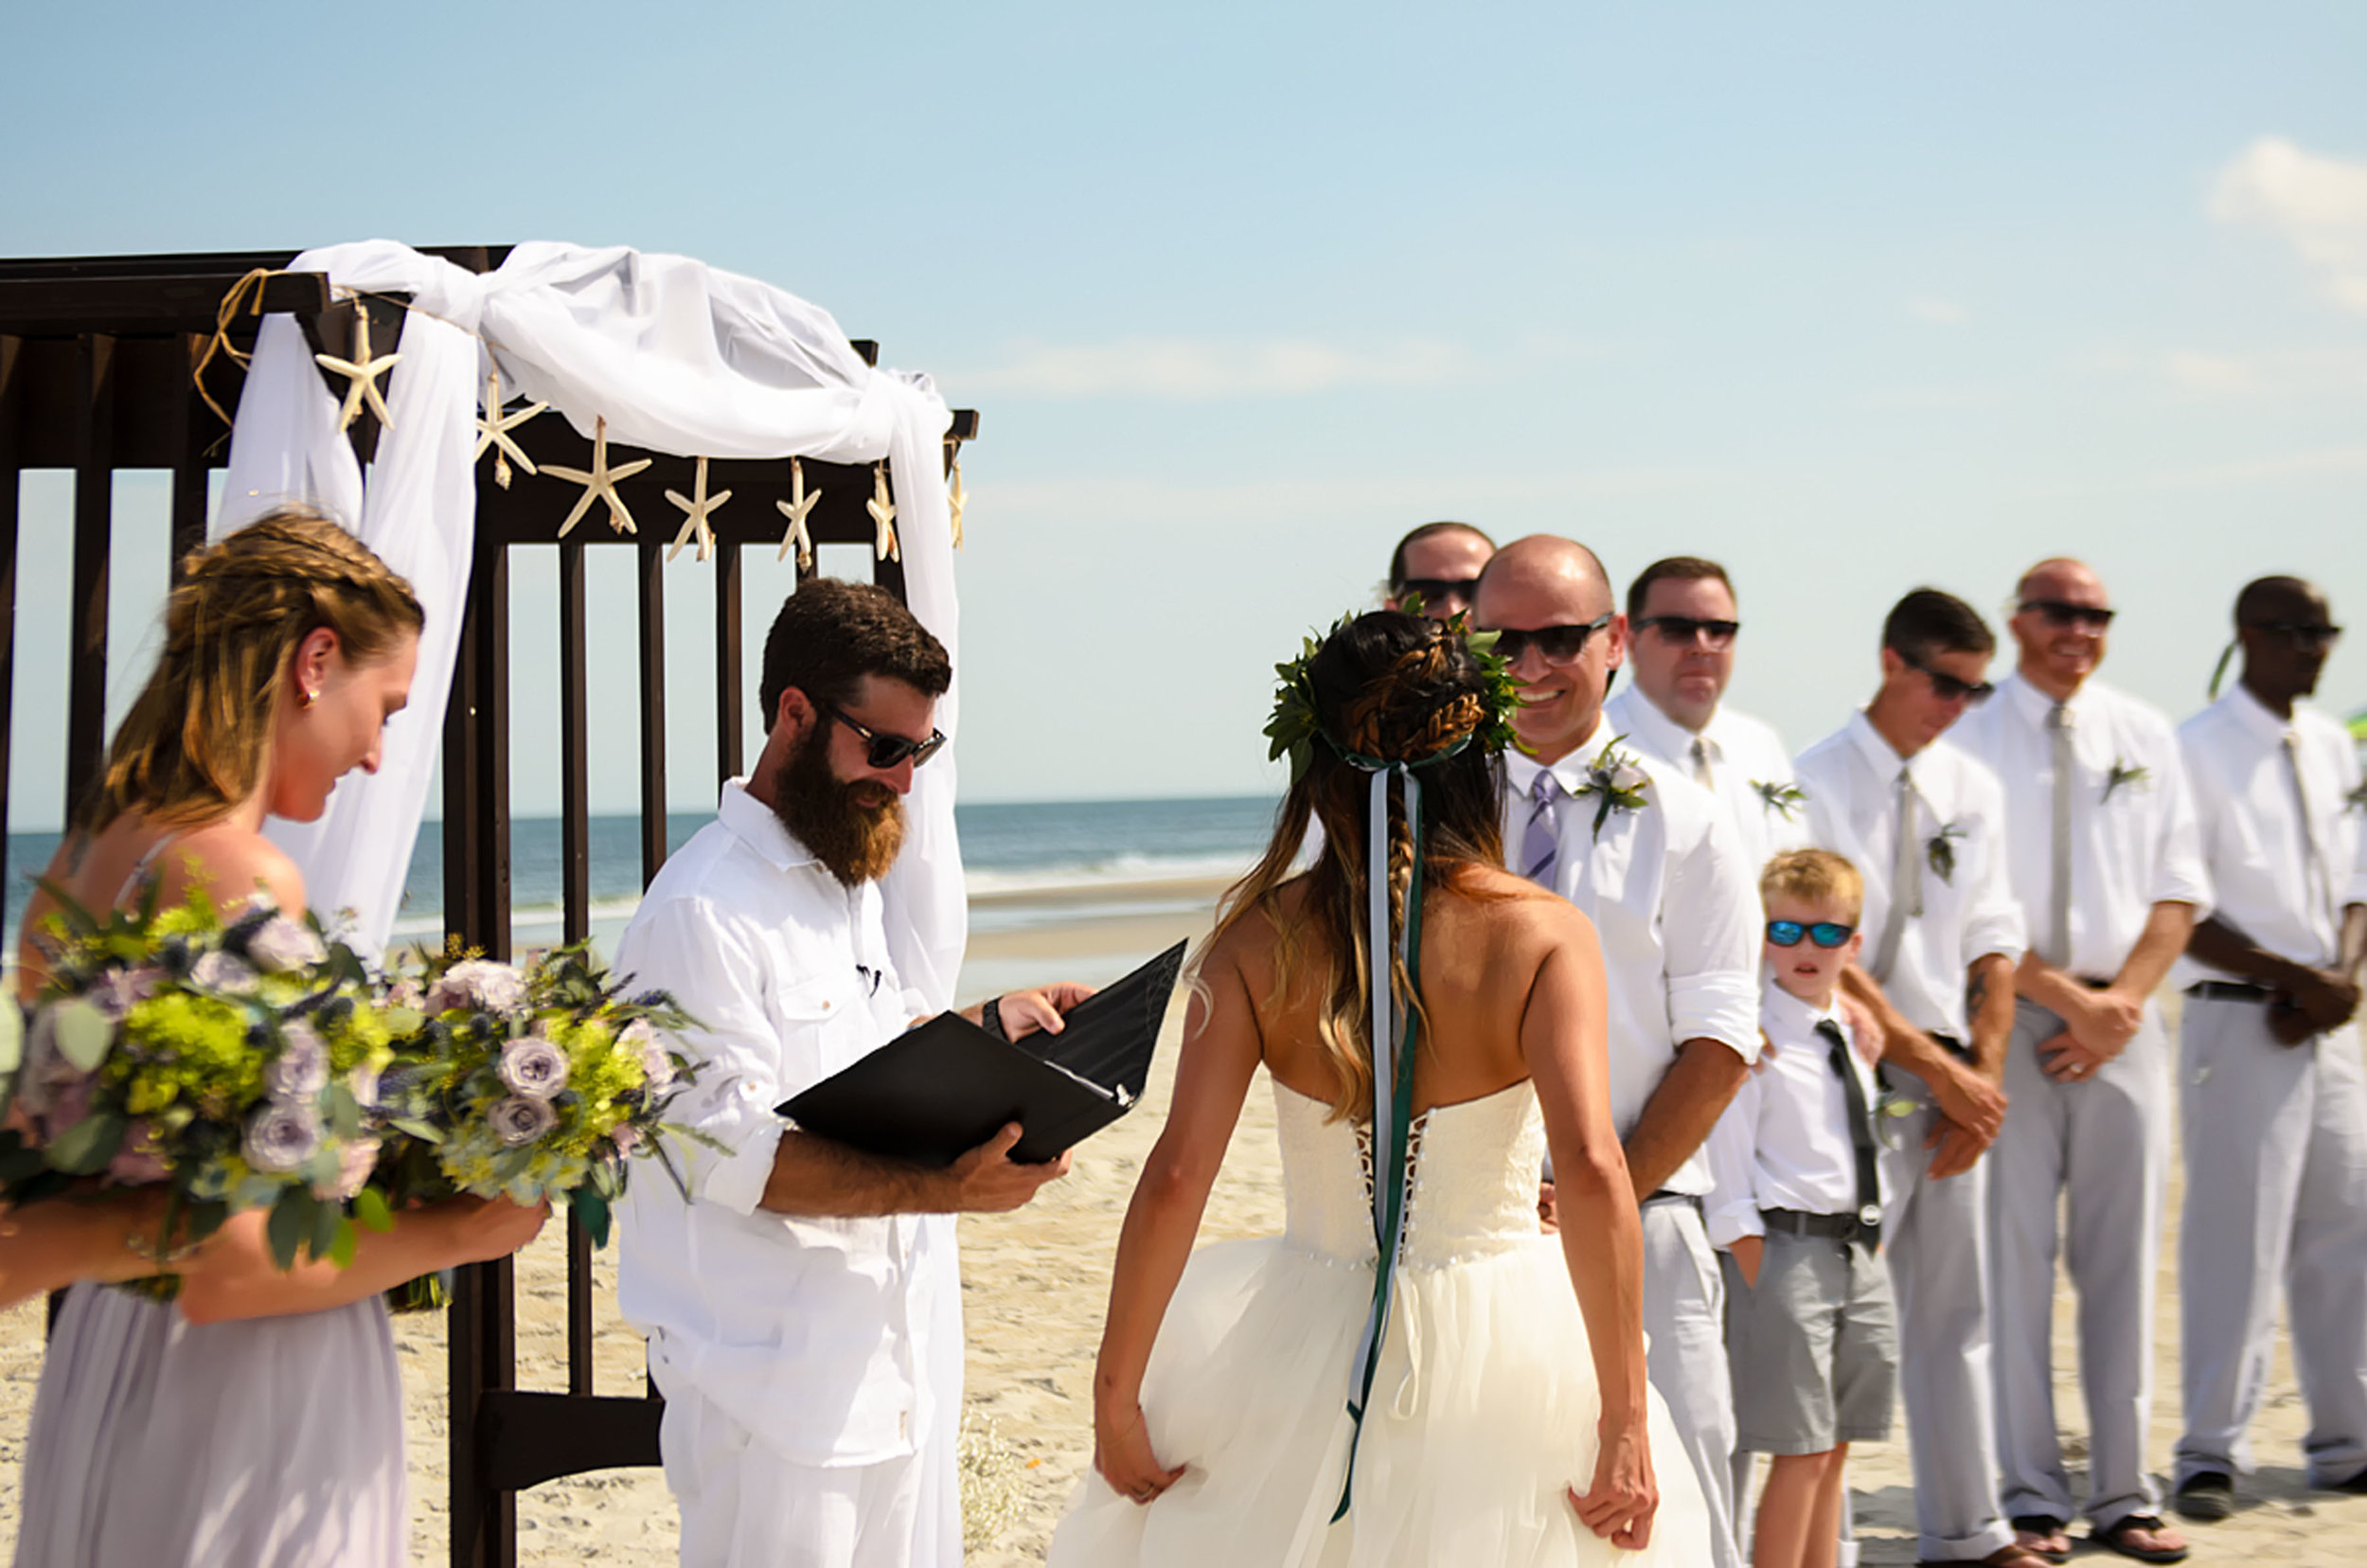 North_Carolina_Wedding_Photographer_Tiffany_Abruzzo_Ceremony_25.jpg